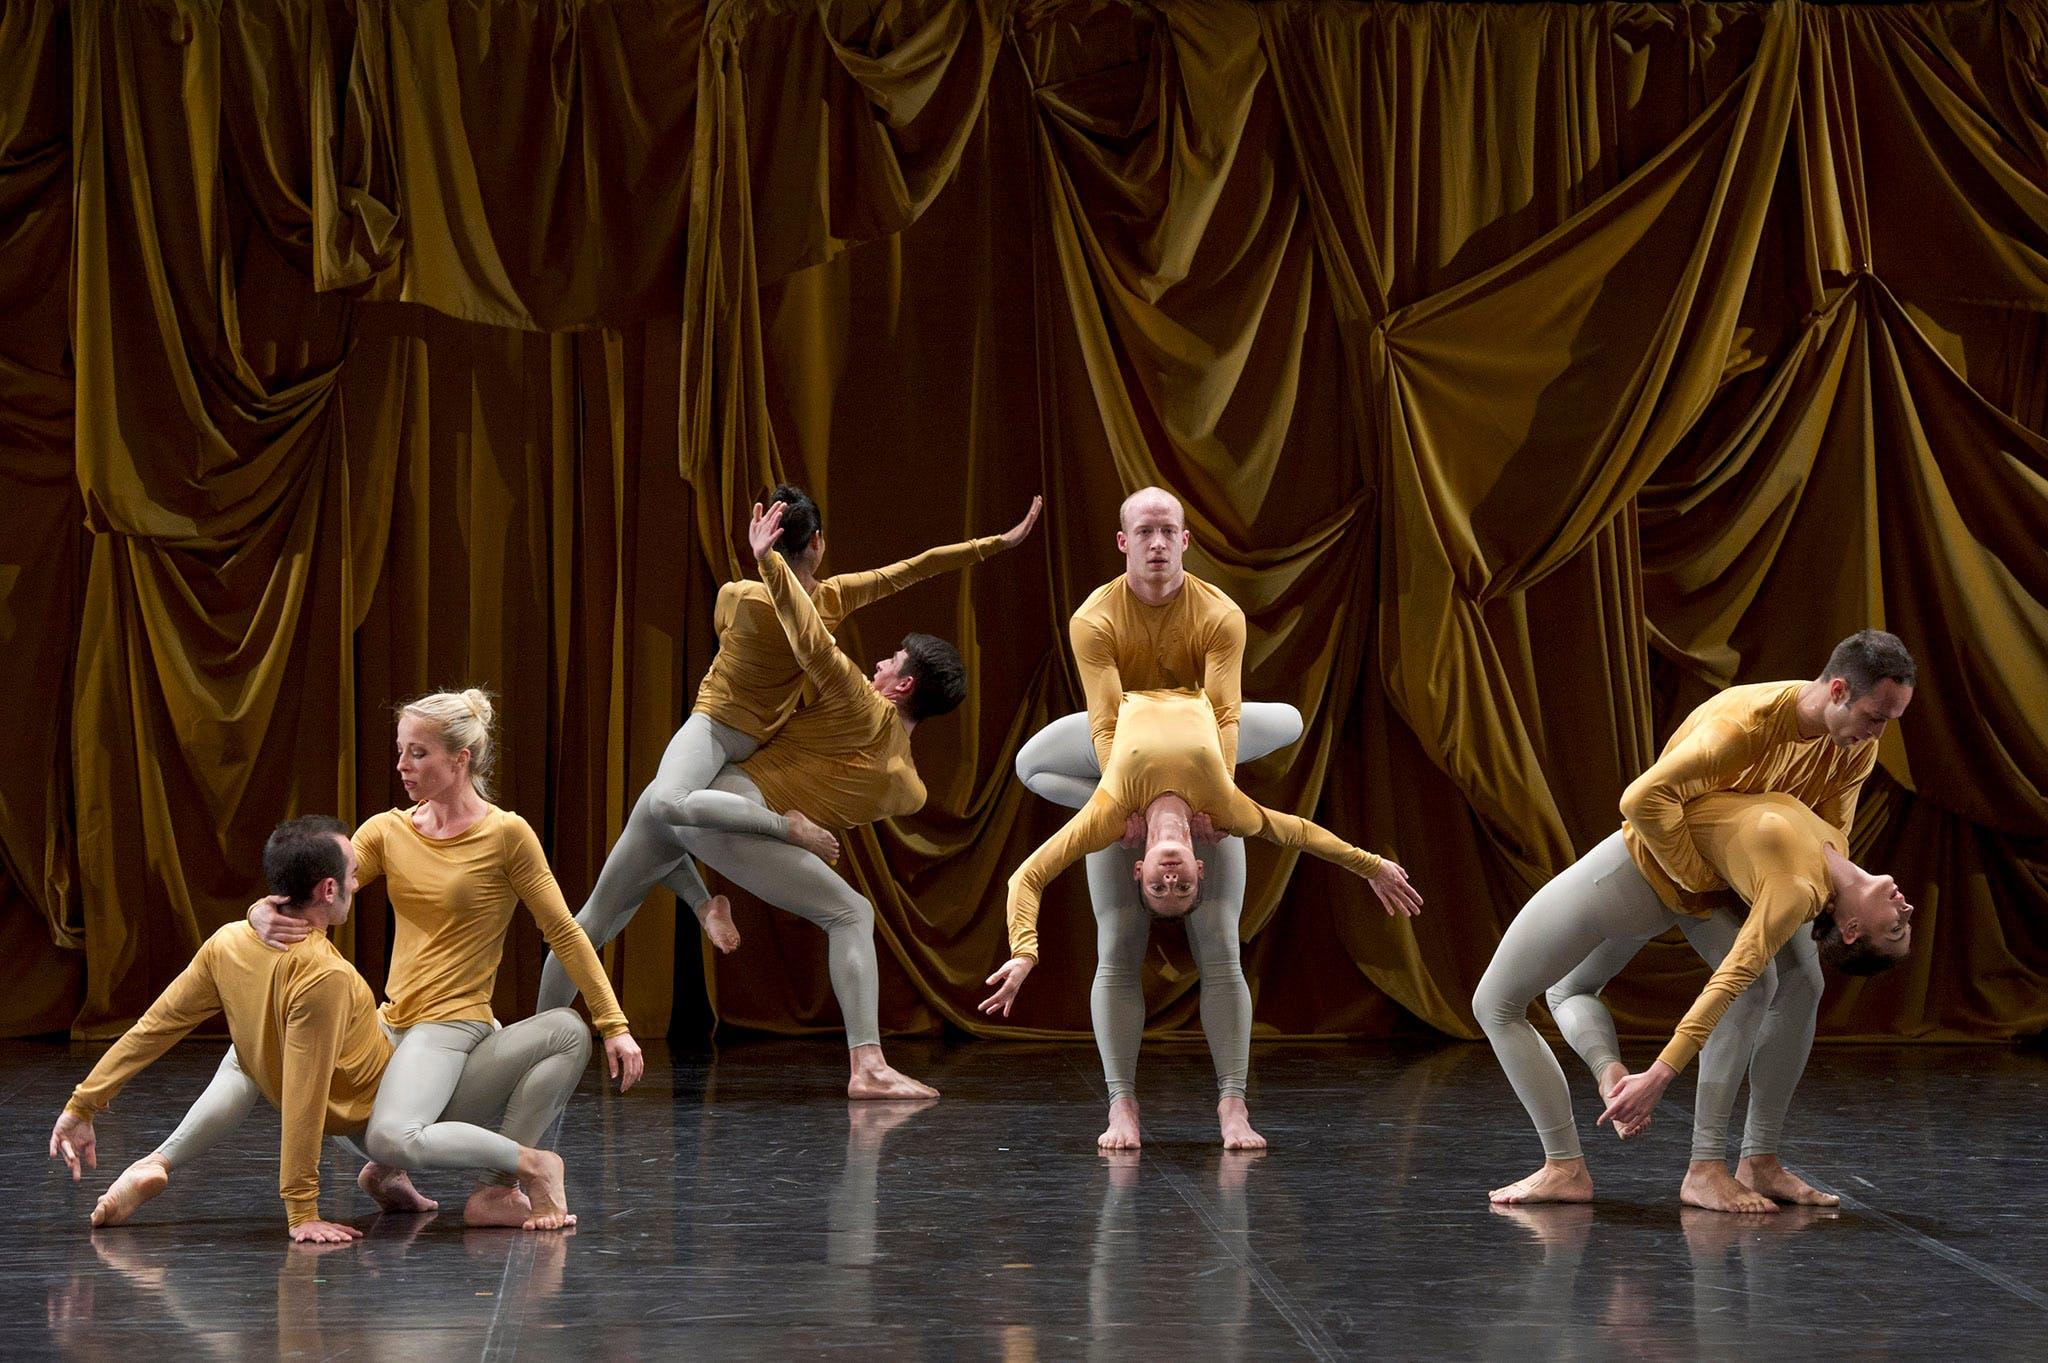 Performance still of Sounddance by Ballet de Lorraine